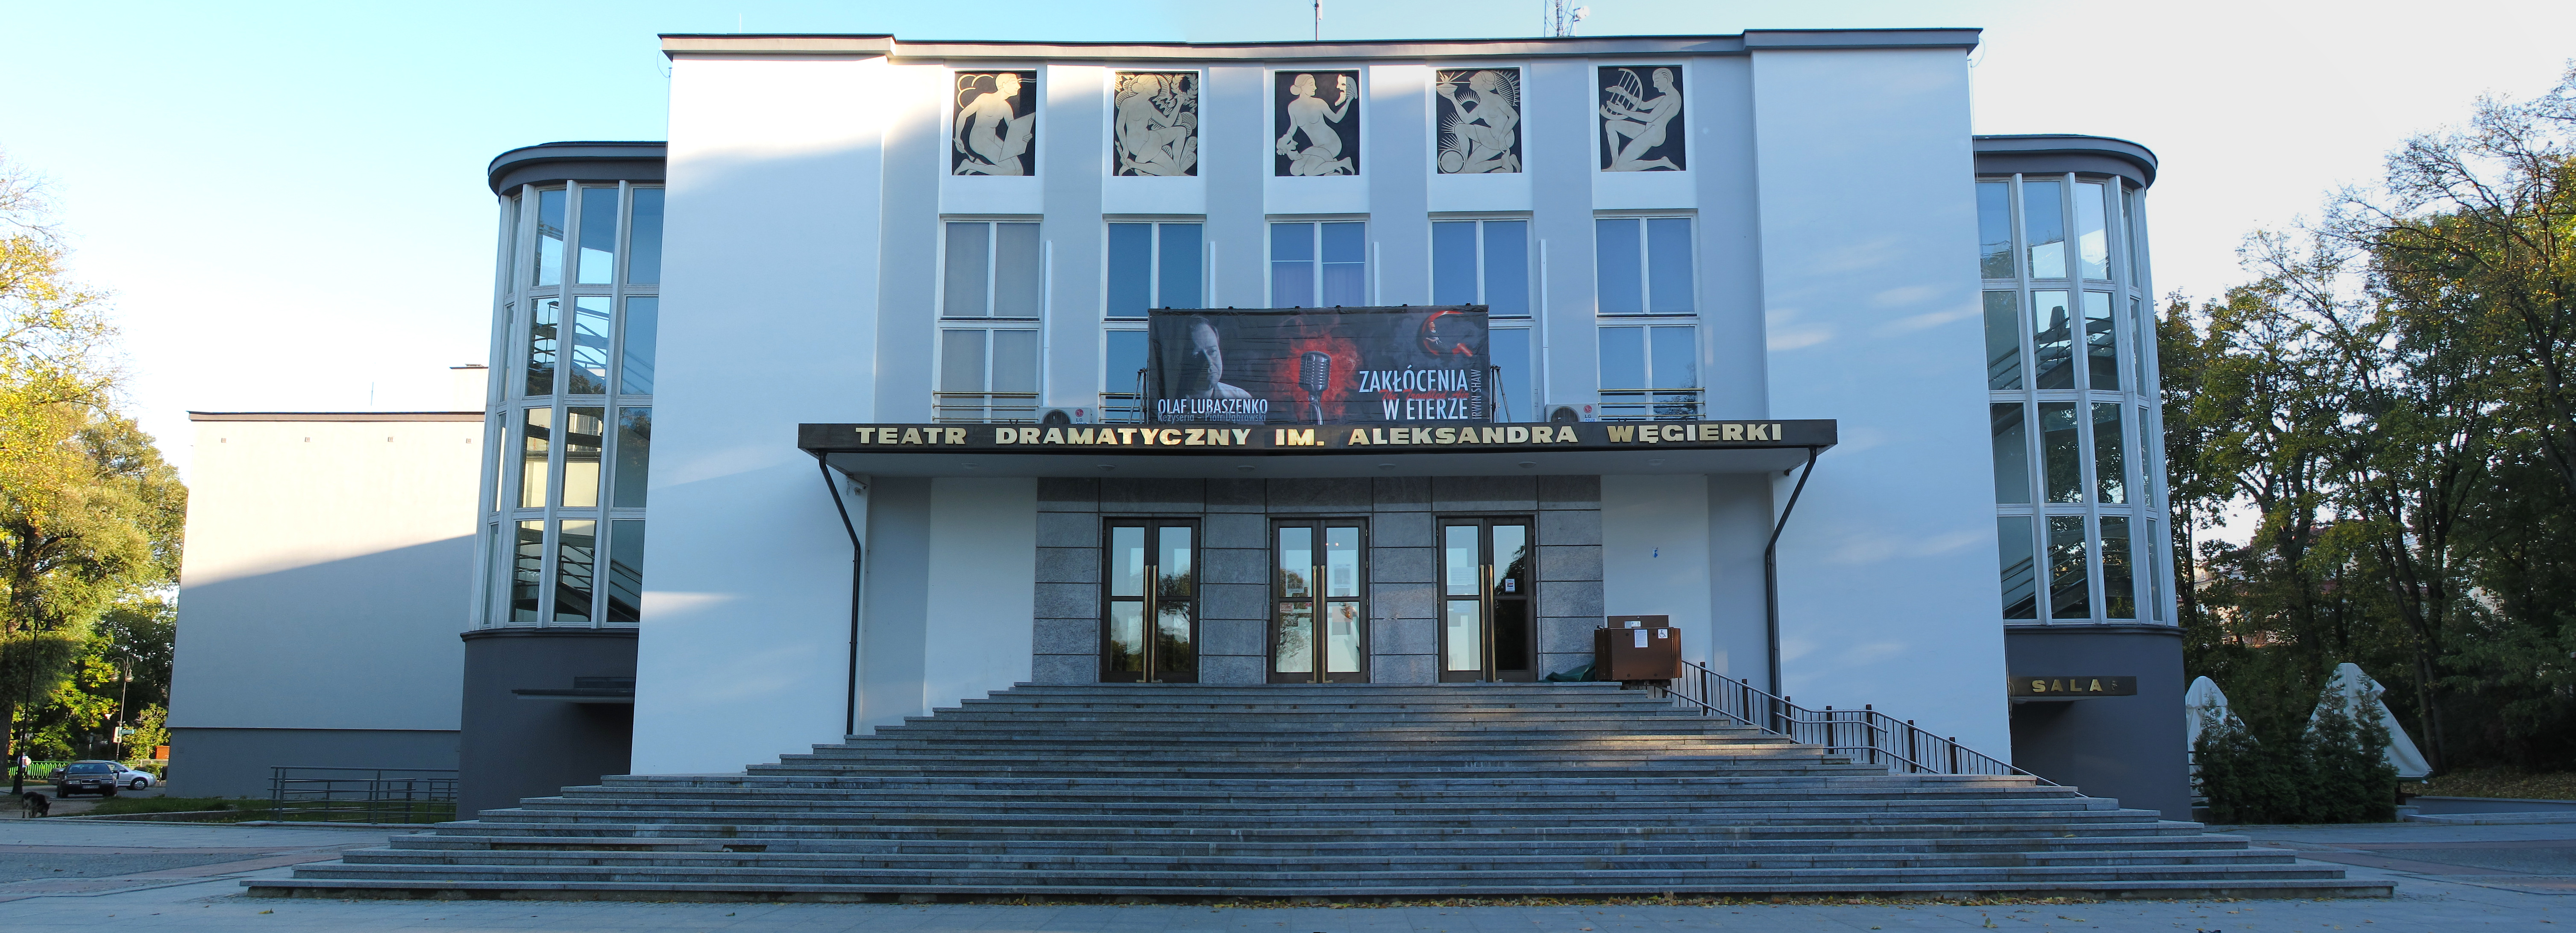 Balstogės Aleksander Węgierko dramos teatras